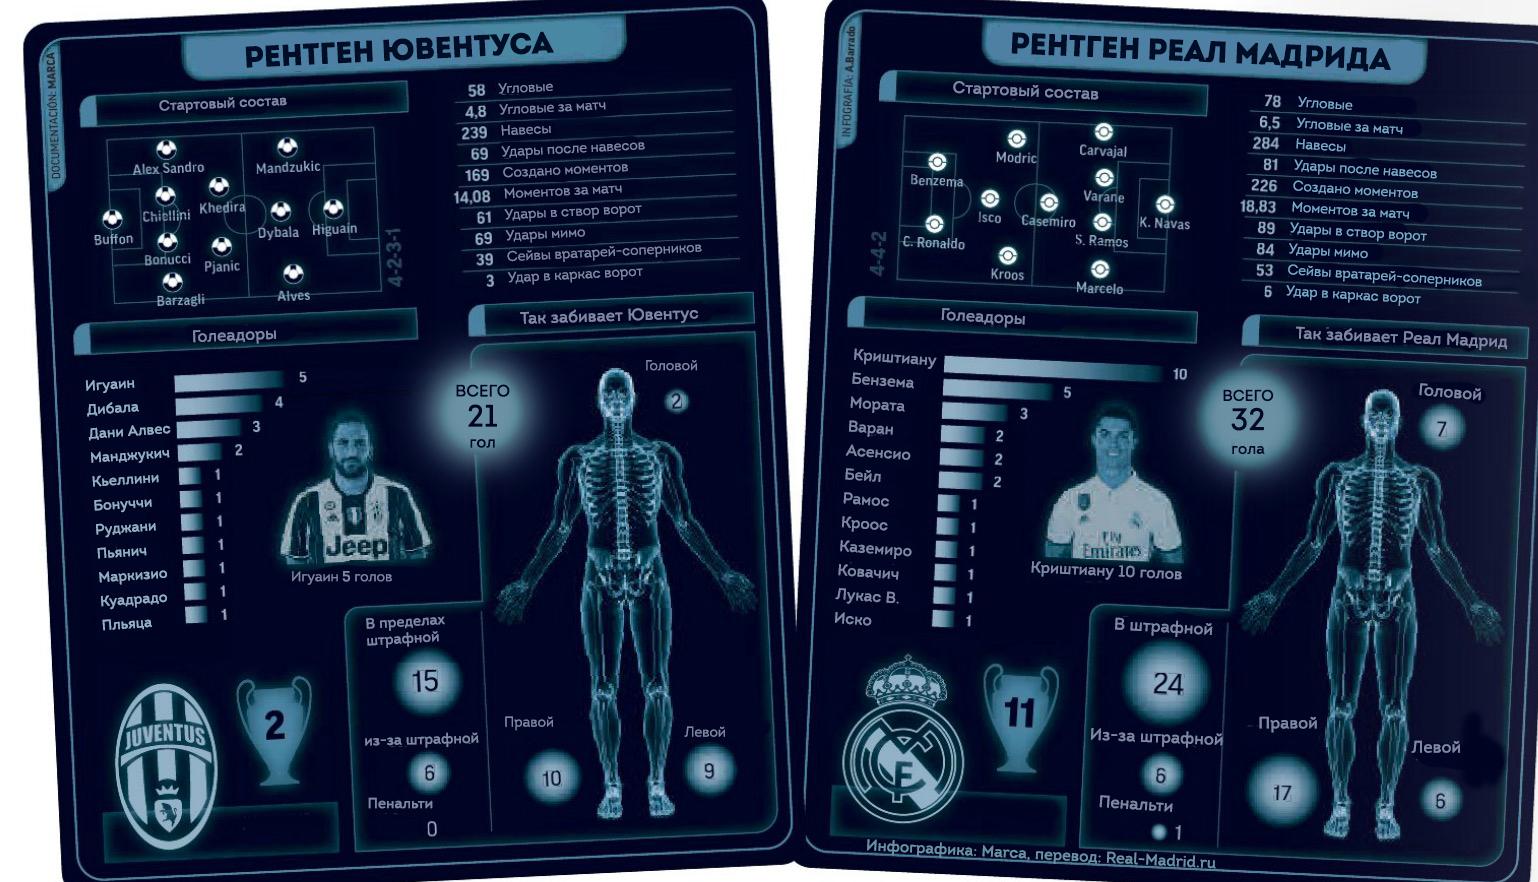 Инфографика Ювентус Реал Мадрид